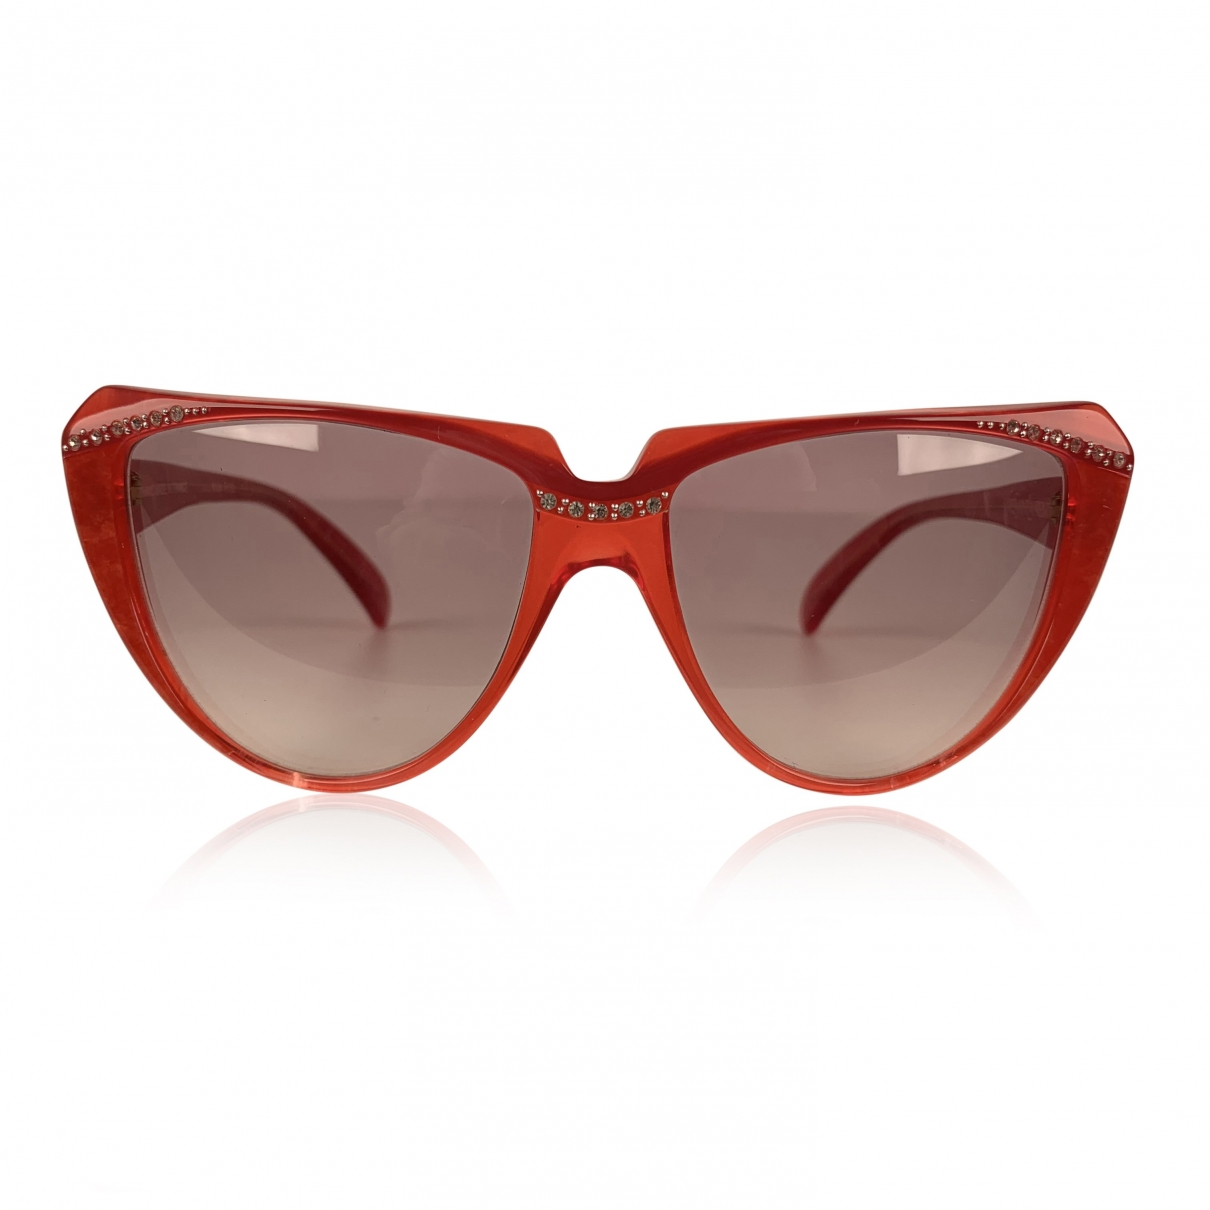 Yves Saint Laurent \N Sonnenbrillen in  Rot Kunststoff